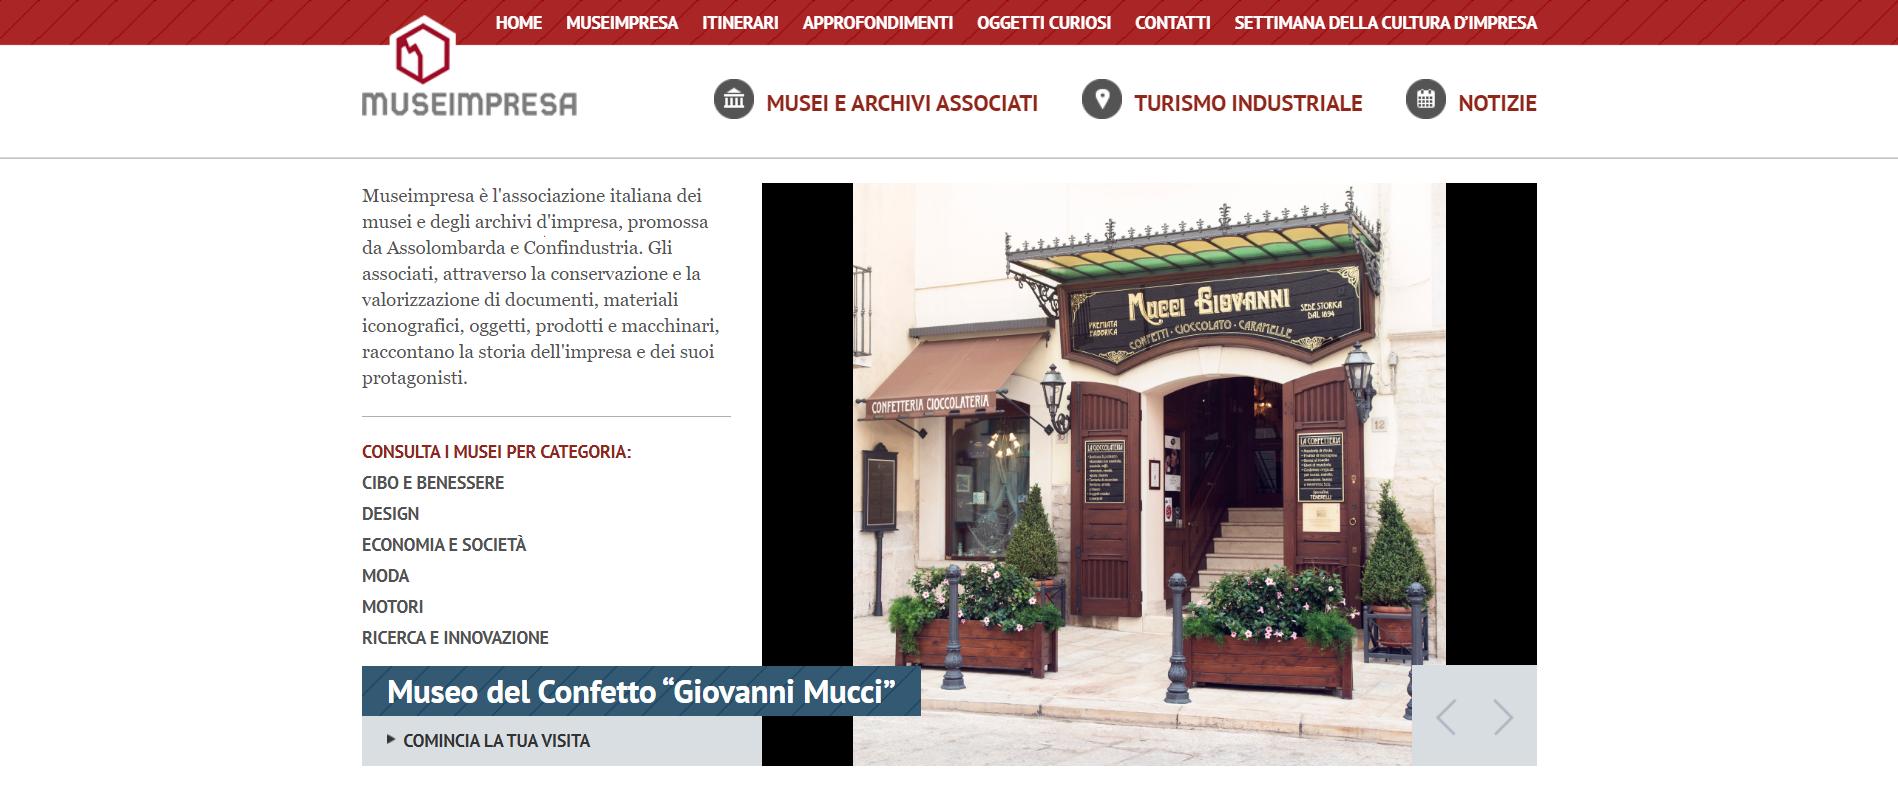 Musei impresa home page